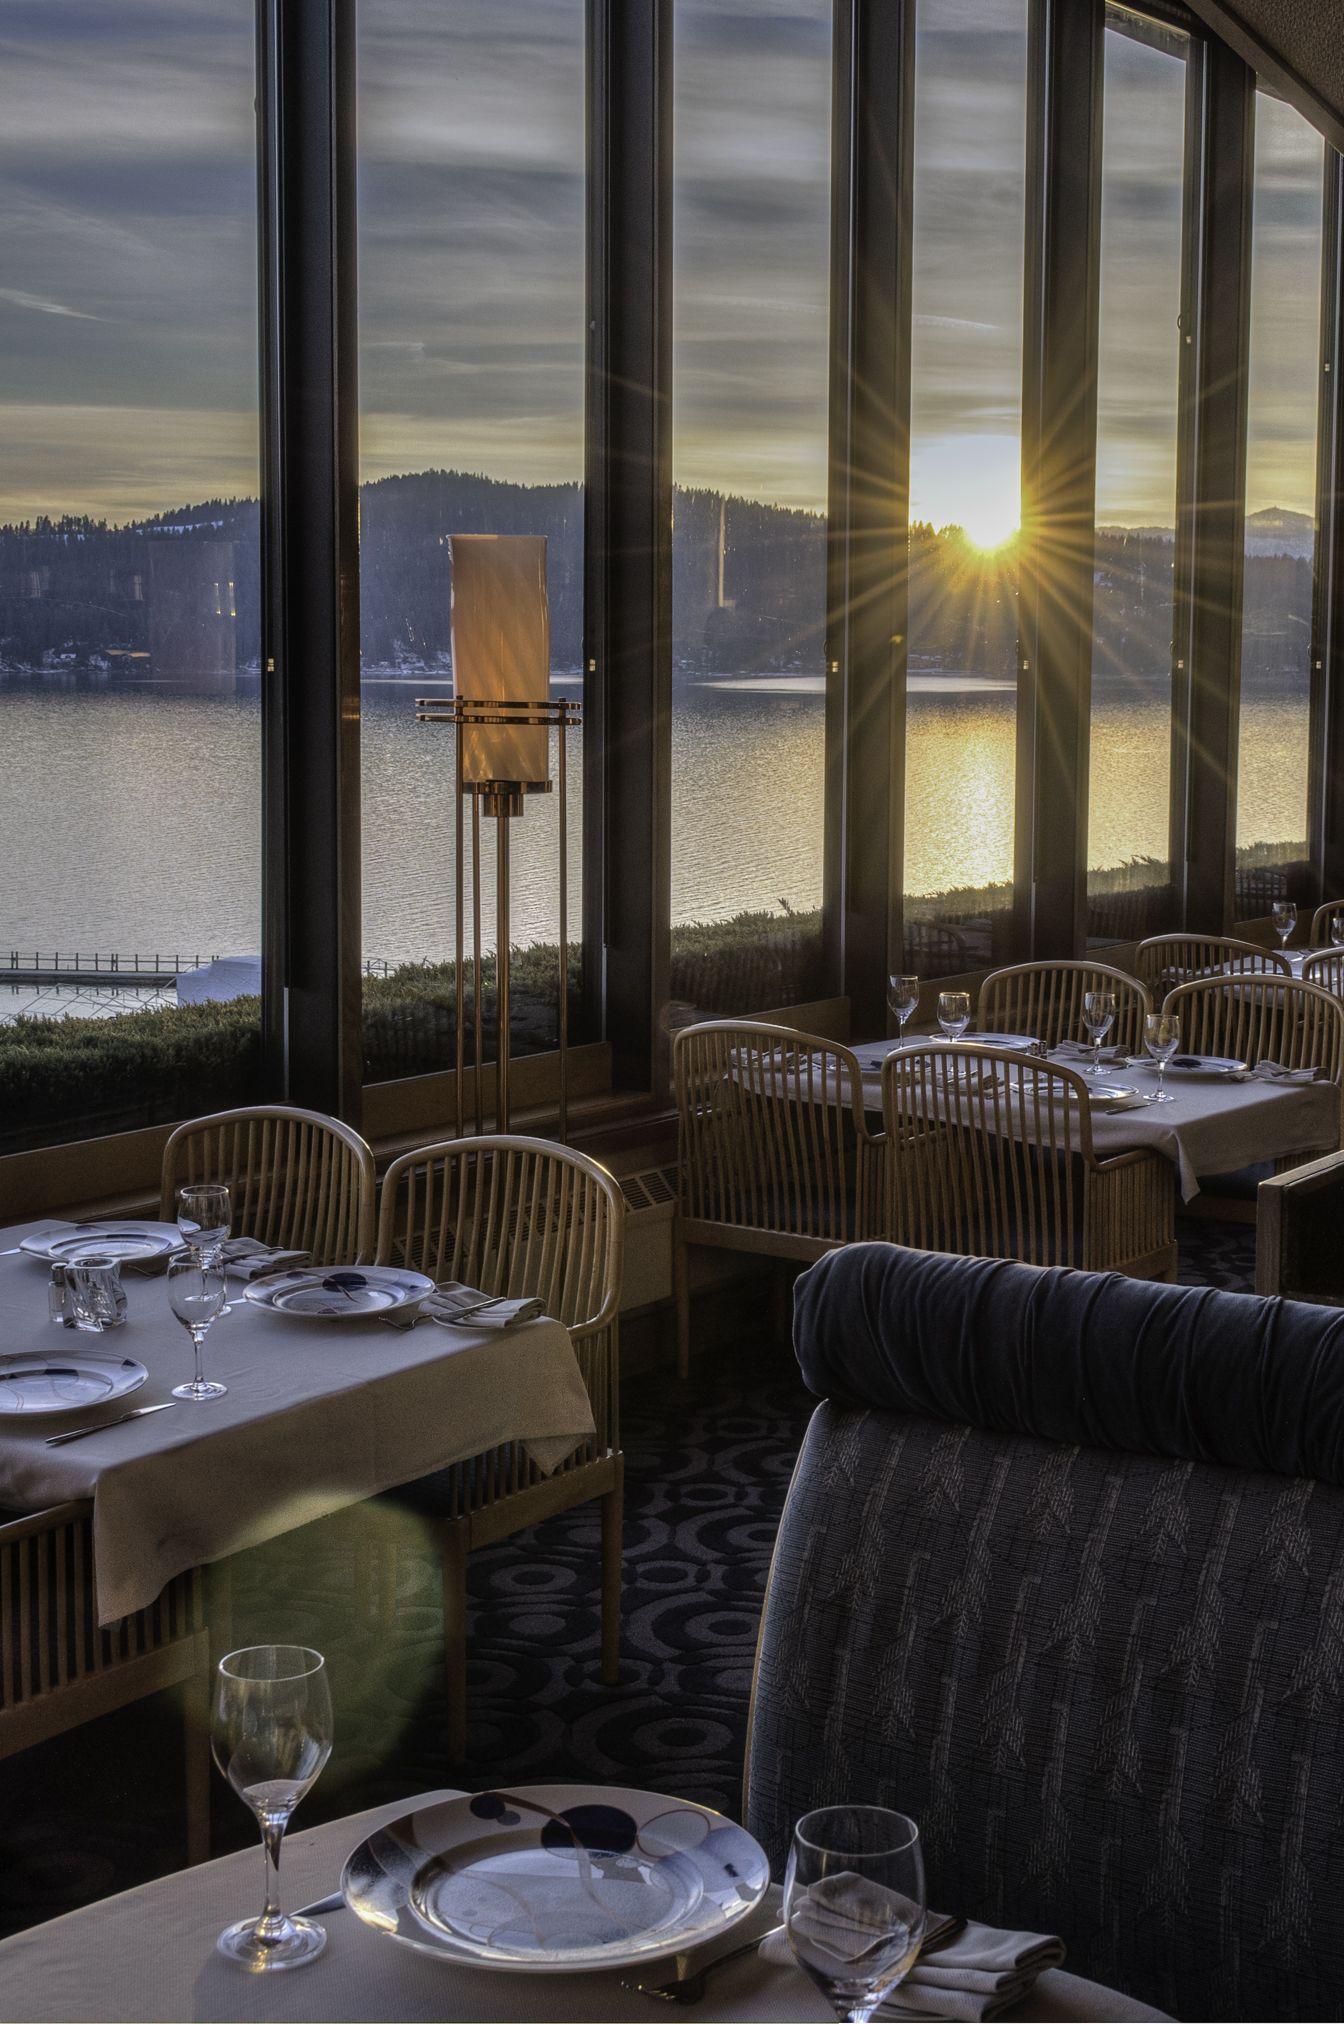 34++ Cda golf resort restaurant ideas in 2021